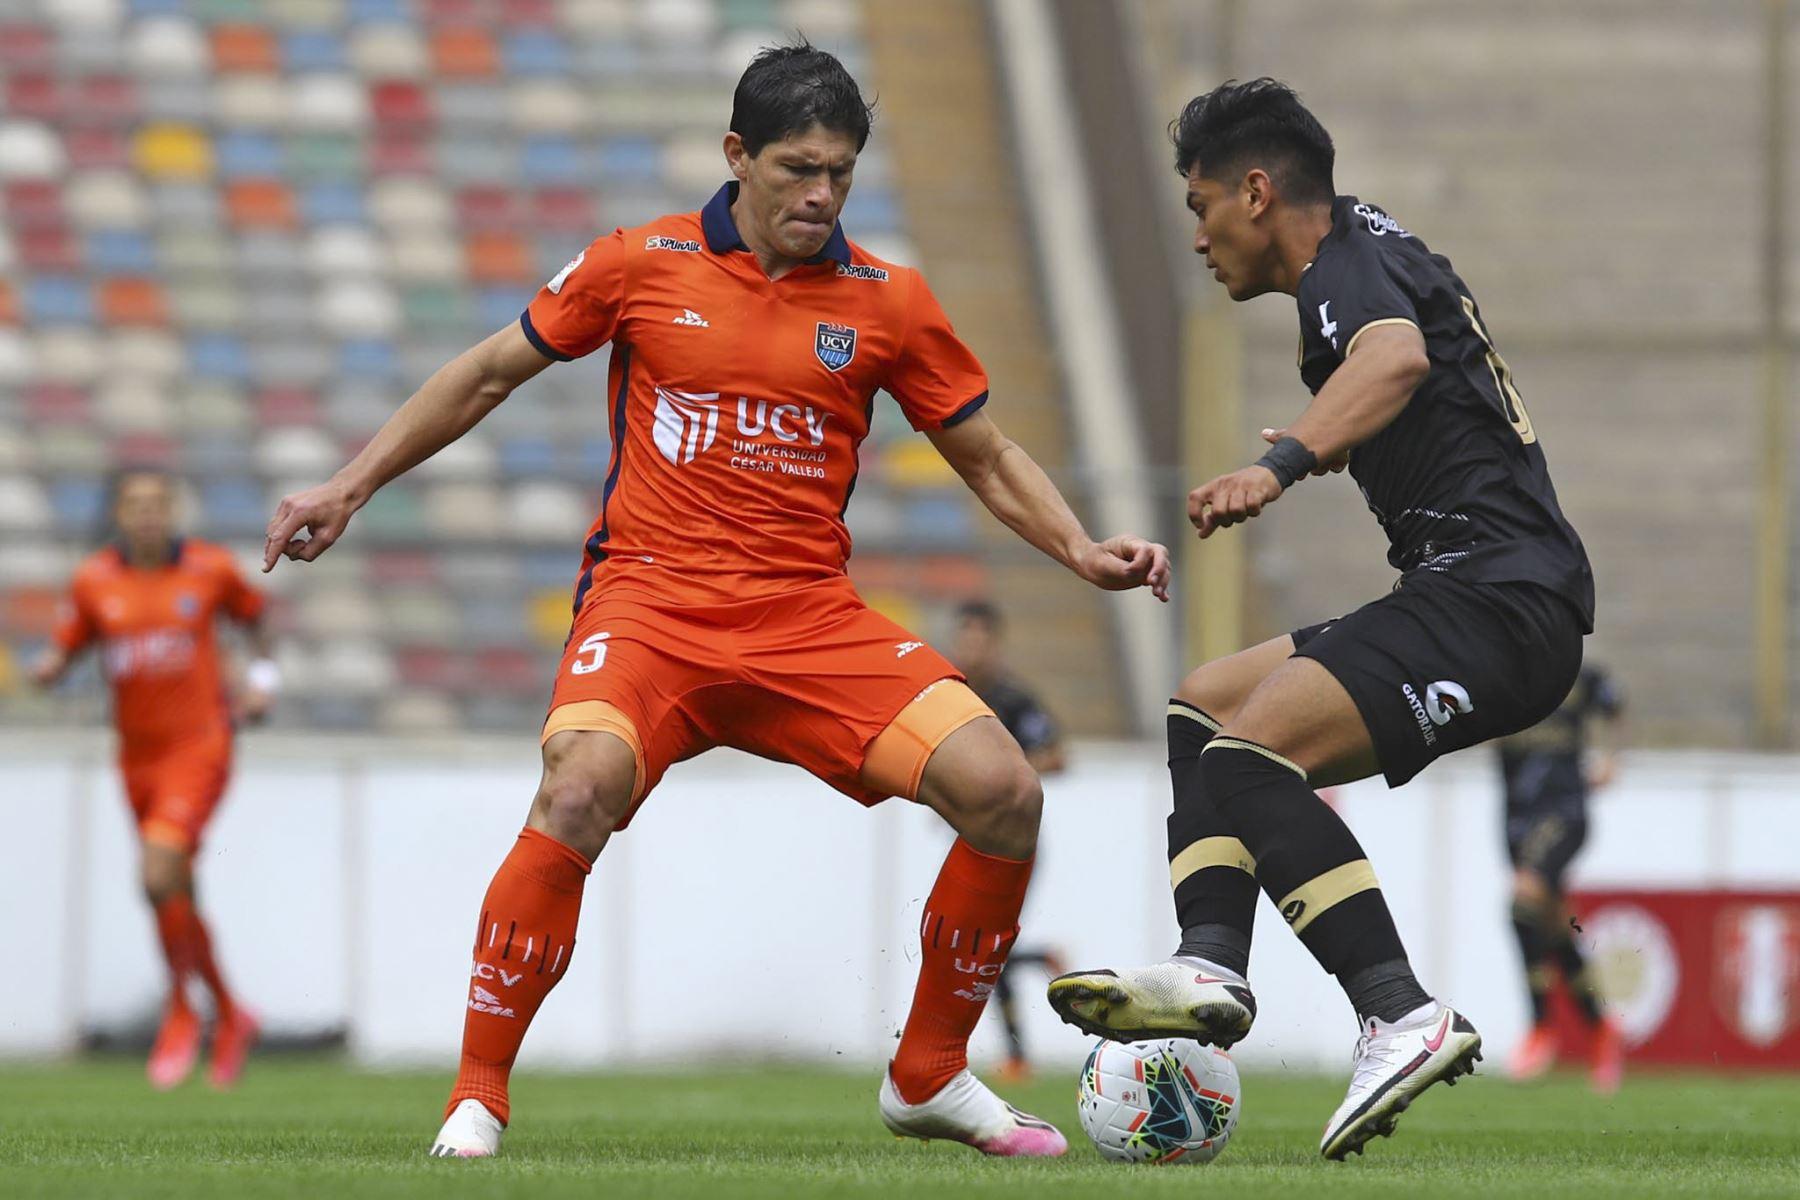 E. Ciucci de Cesar Vallejo se enfrenta ante la marca de Cusco FC por la primera fecha de la Liga 1, en el estadio Monumental. Foto: Liga 1